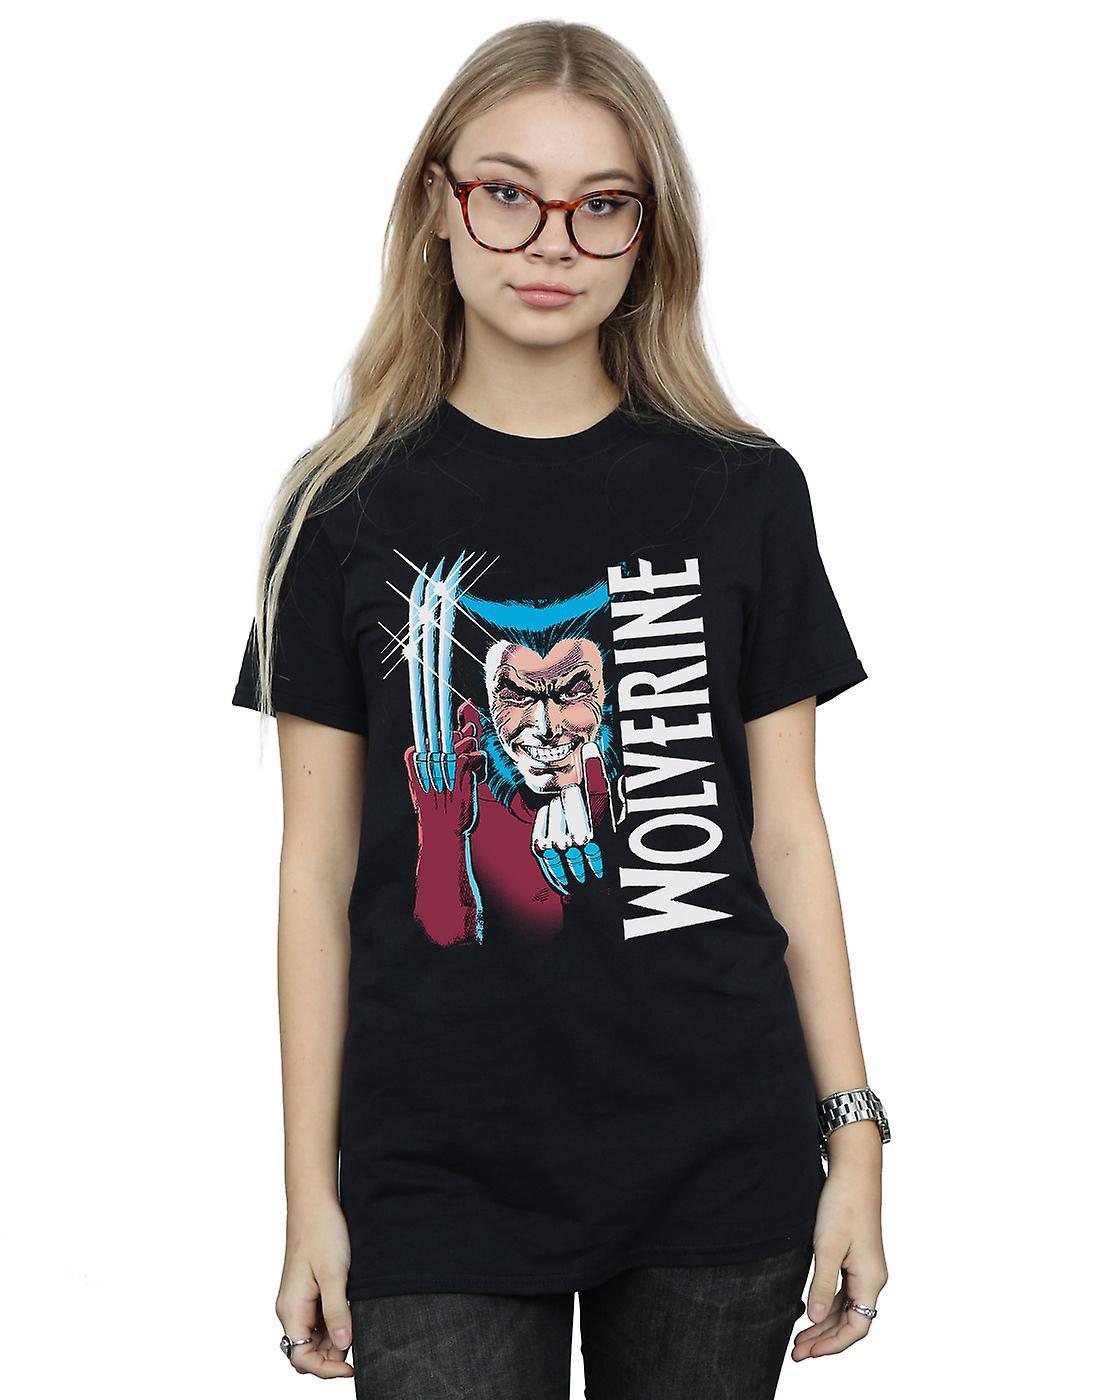 Marvel Women's X-Men Wolverine Come Here Boyfriend Fit T-Shirt